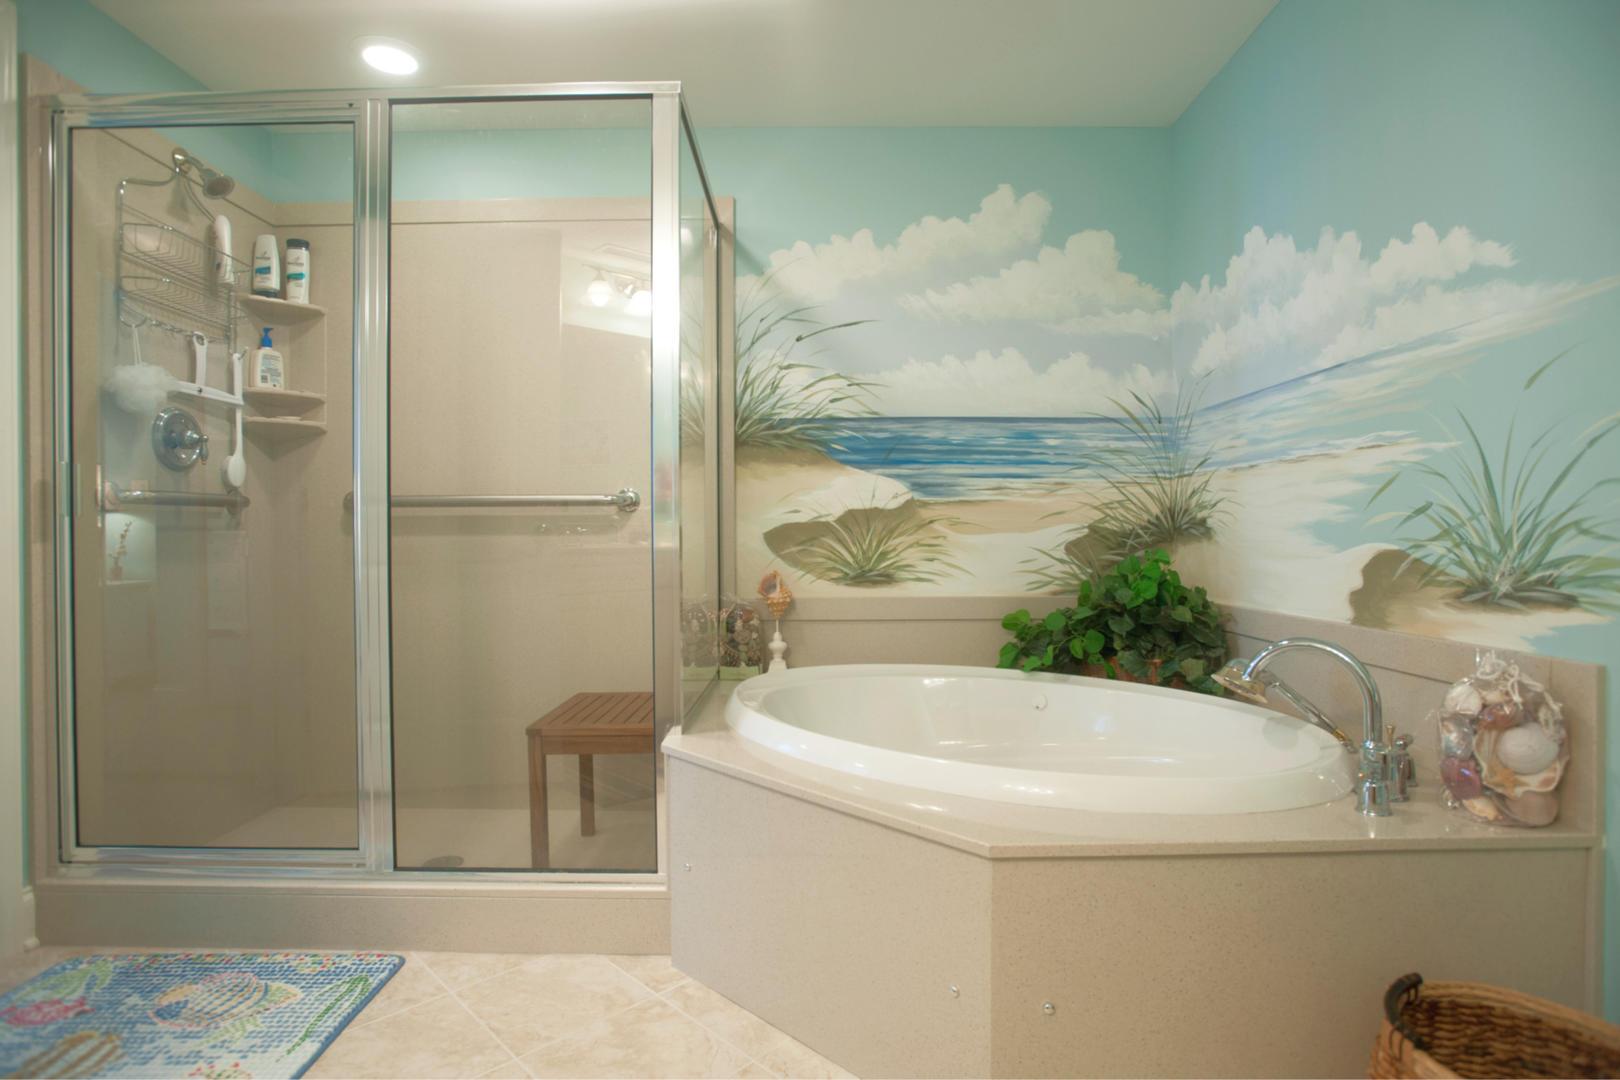 Belmont Towers 411 - Master Bathroom